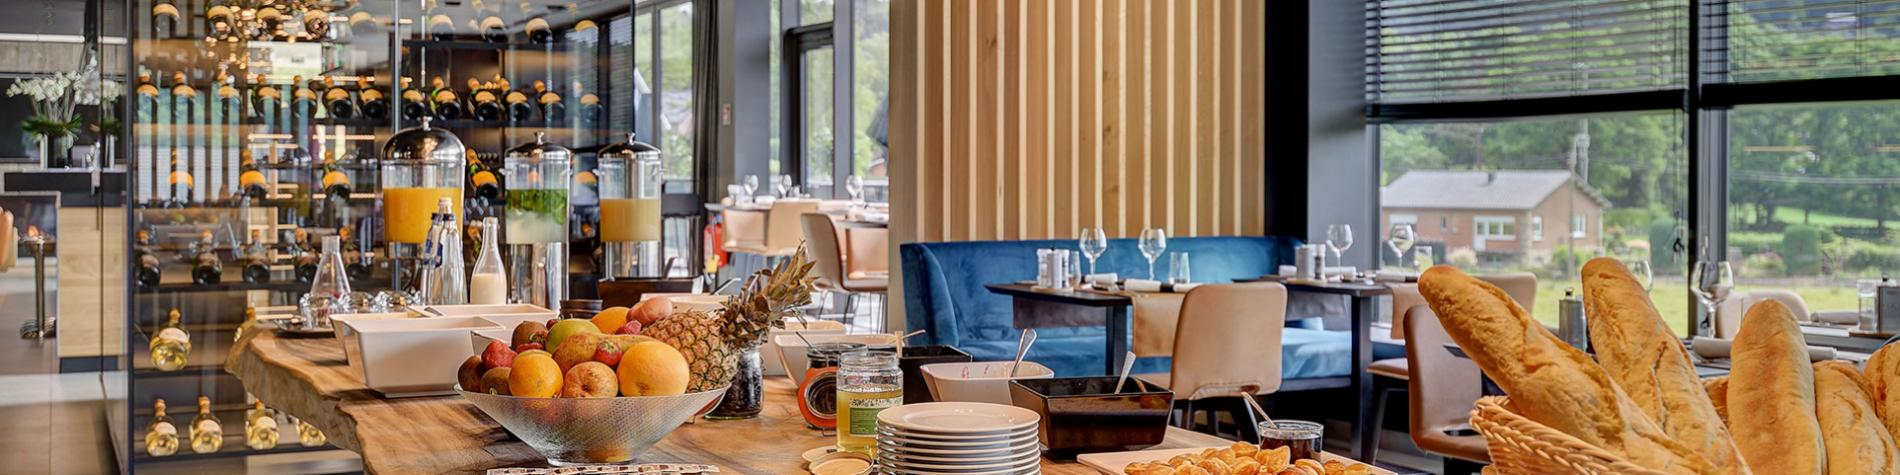 R hotel experiences - wellness - gastronomie - Remouchamps